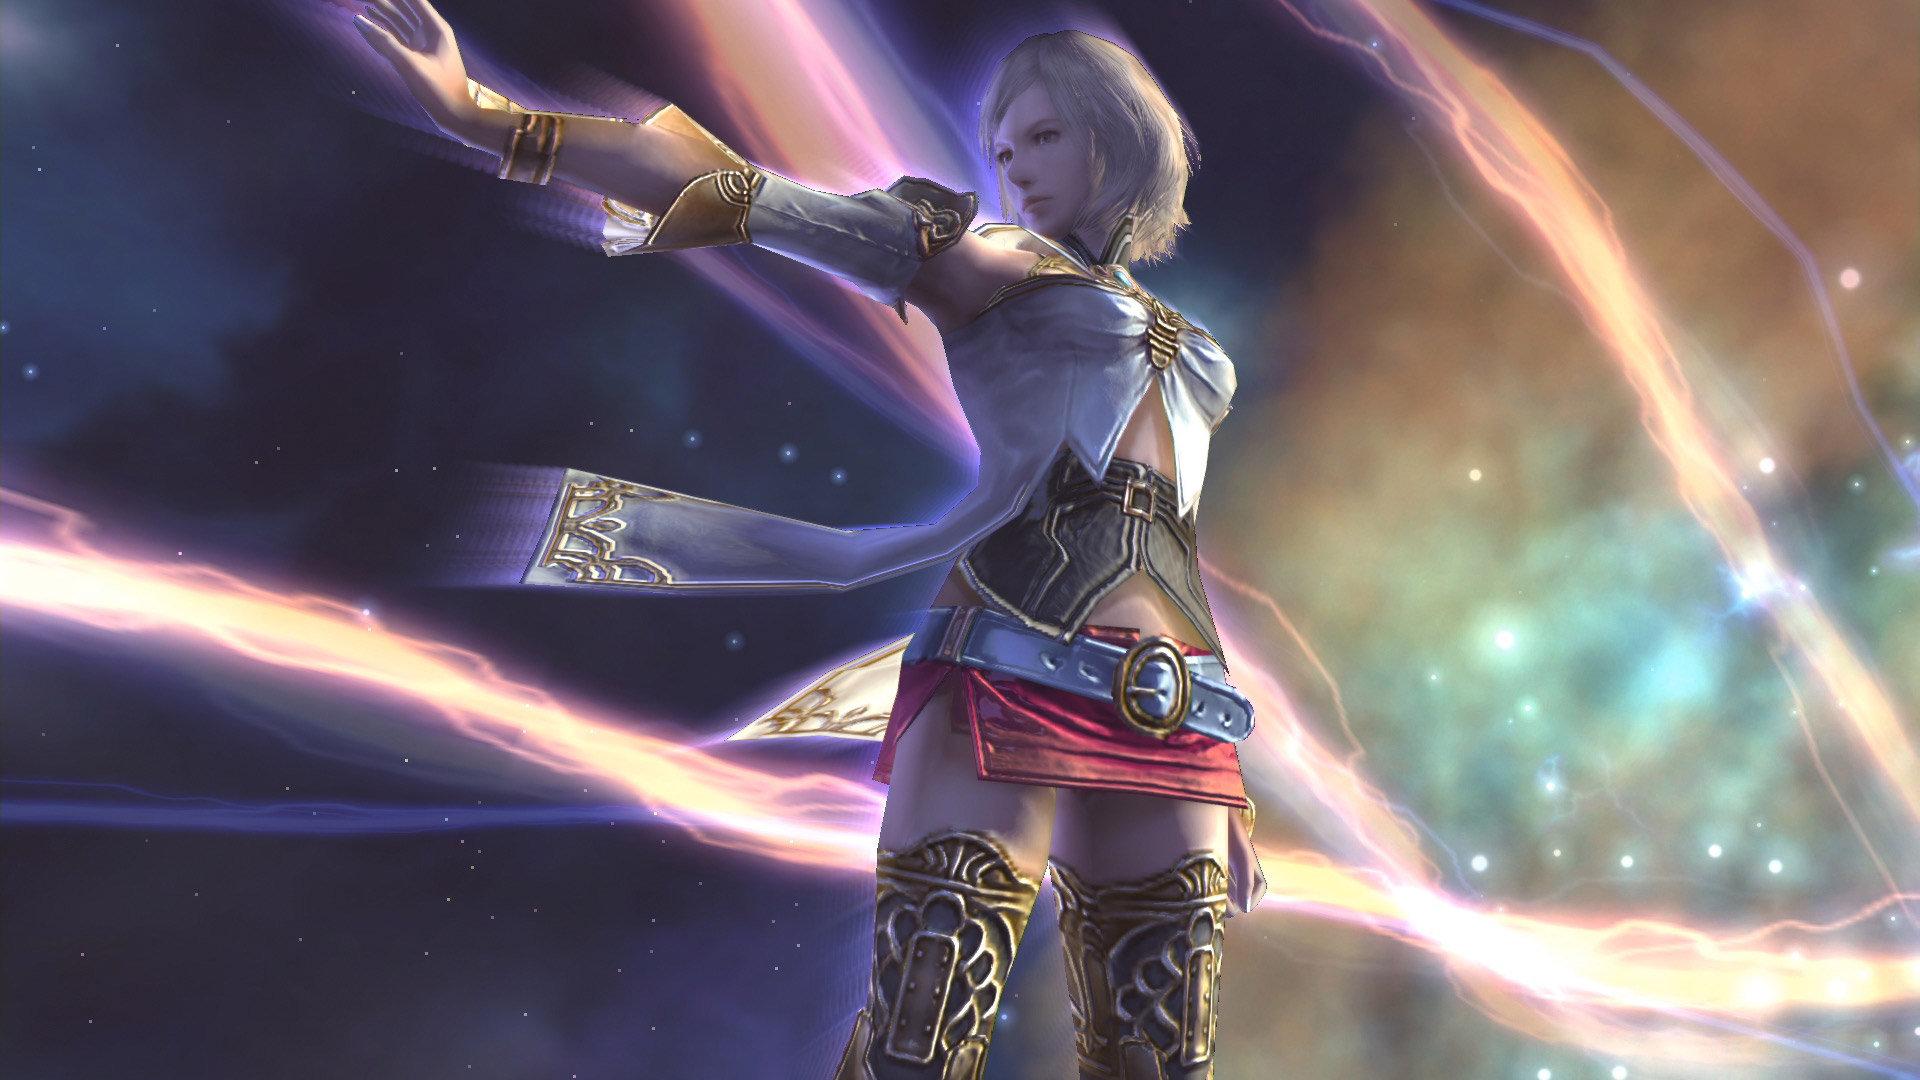 final-fantasy-xii-the-zodiac-age-screen-01-ps4-eu-07jun16